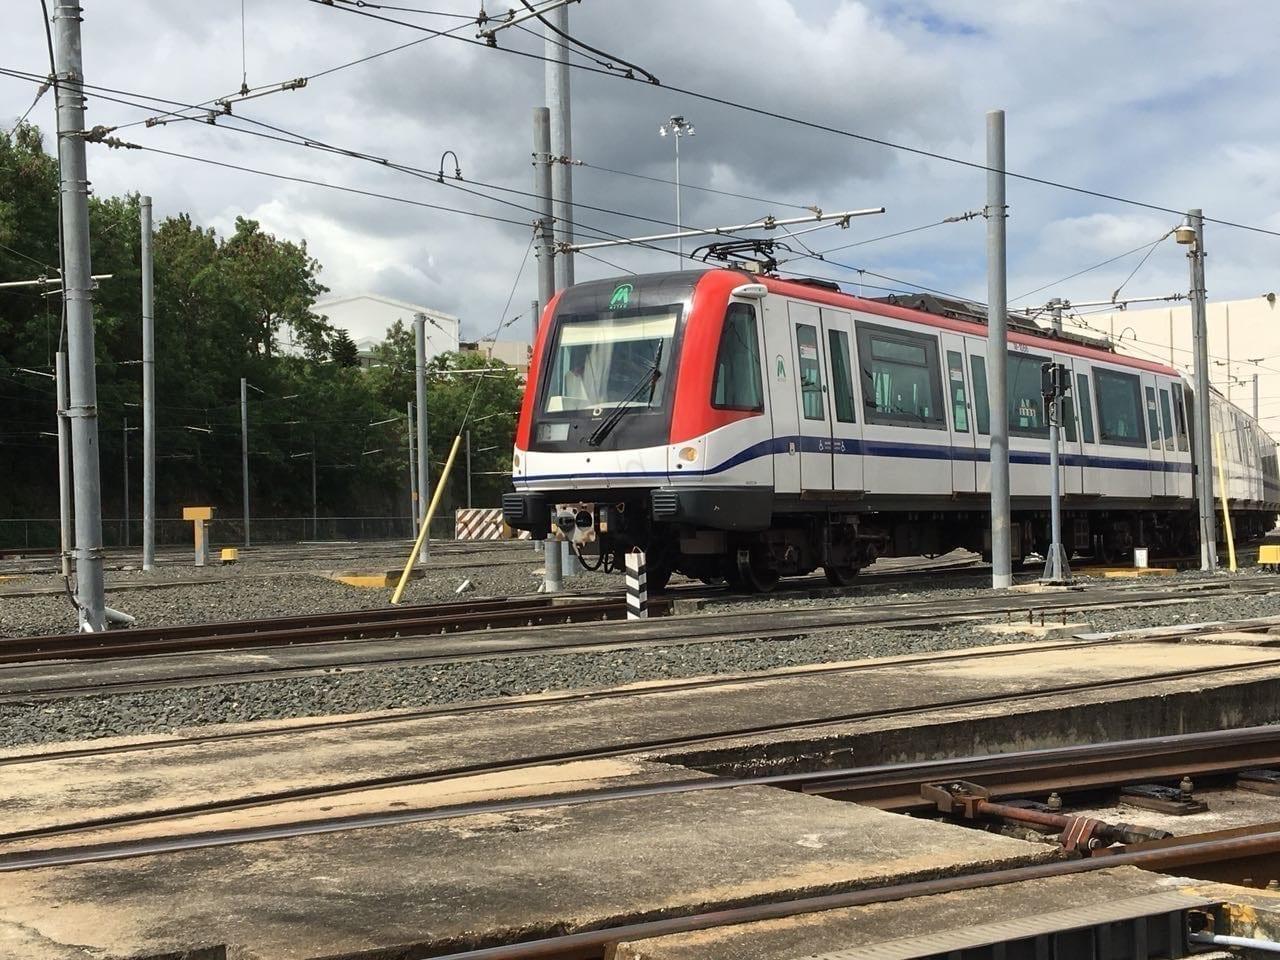 Metro, tren, vagones